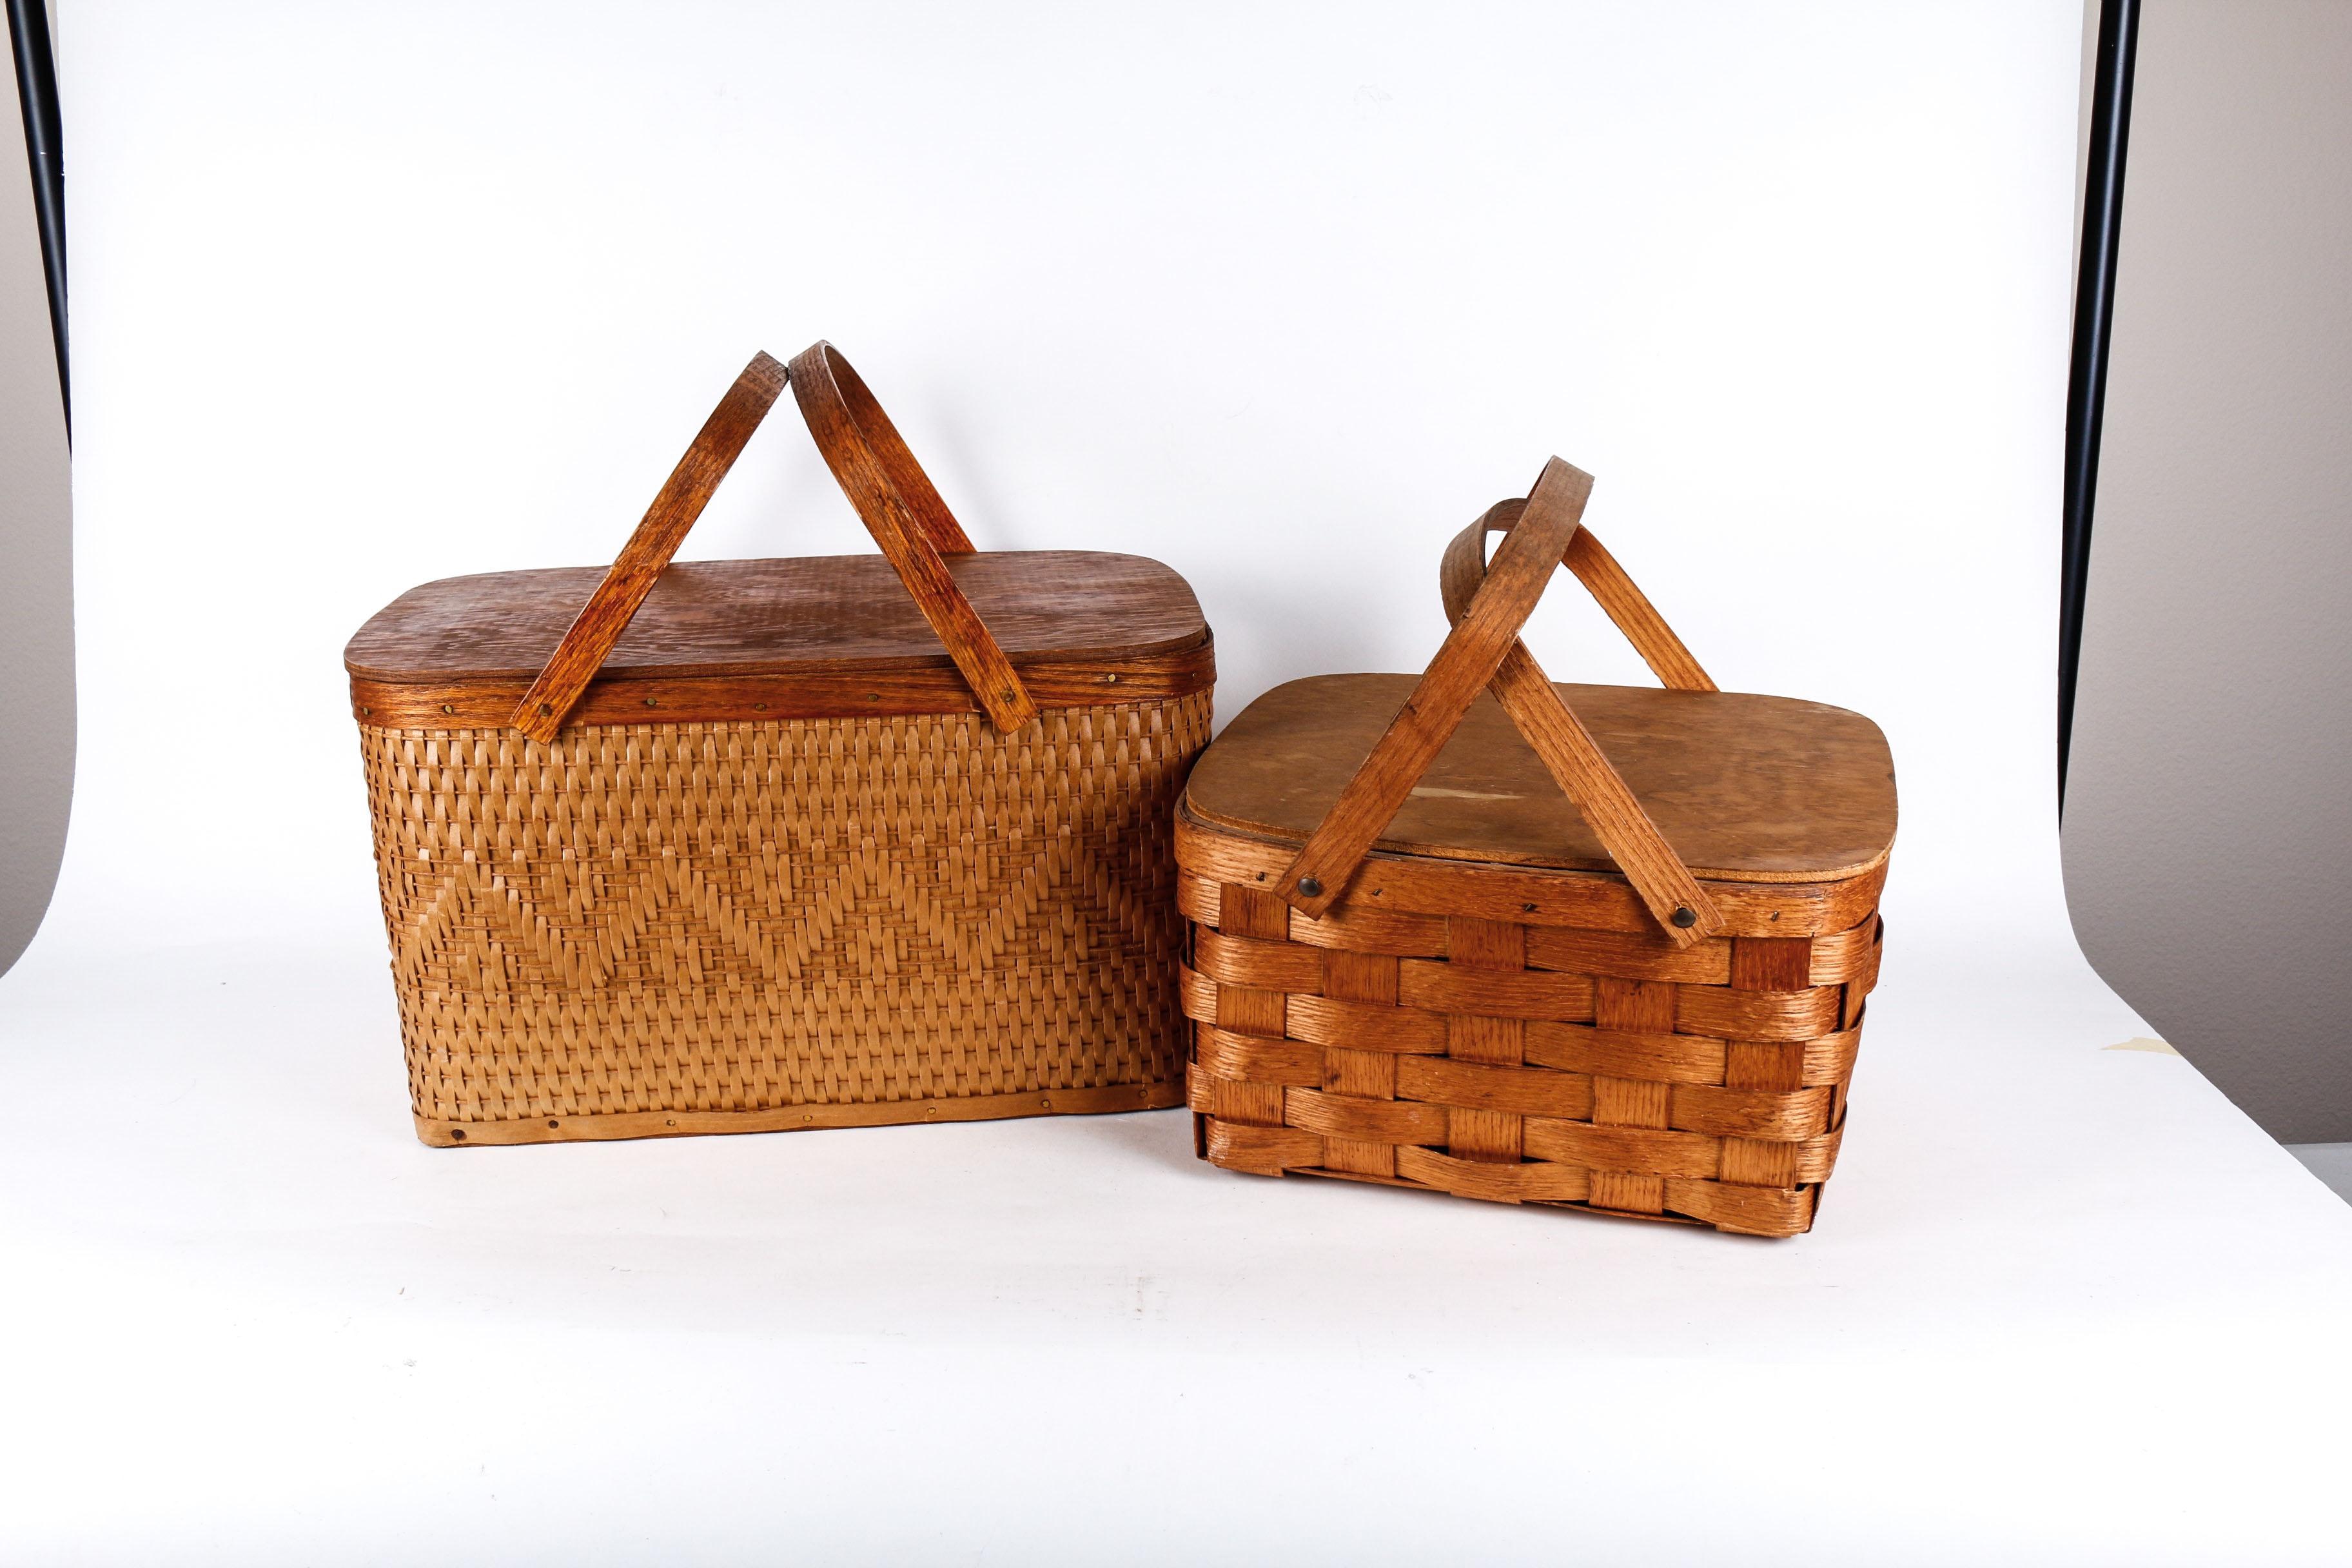 Pair of Vintage Picnic Baskets